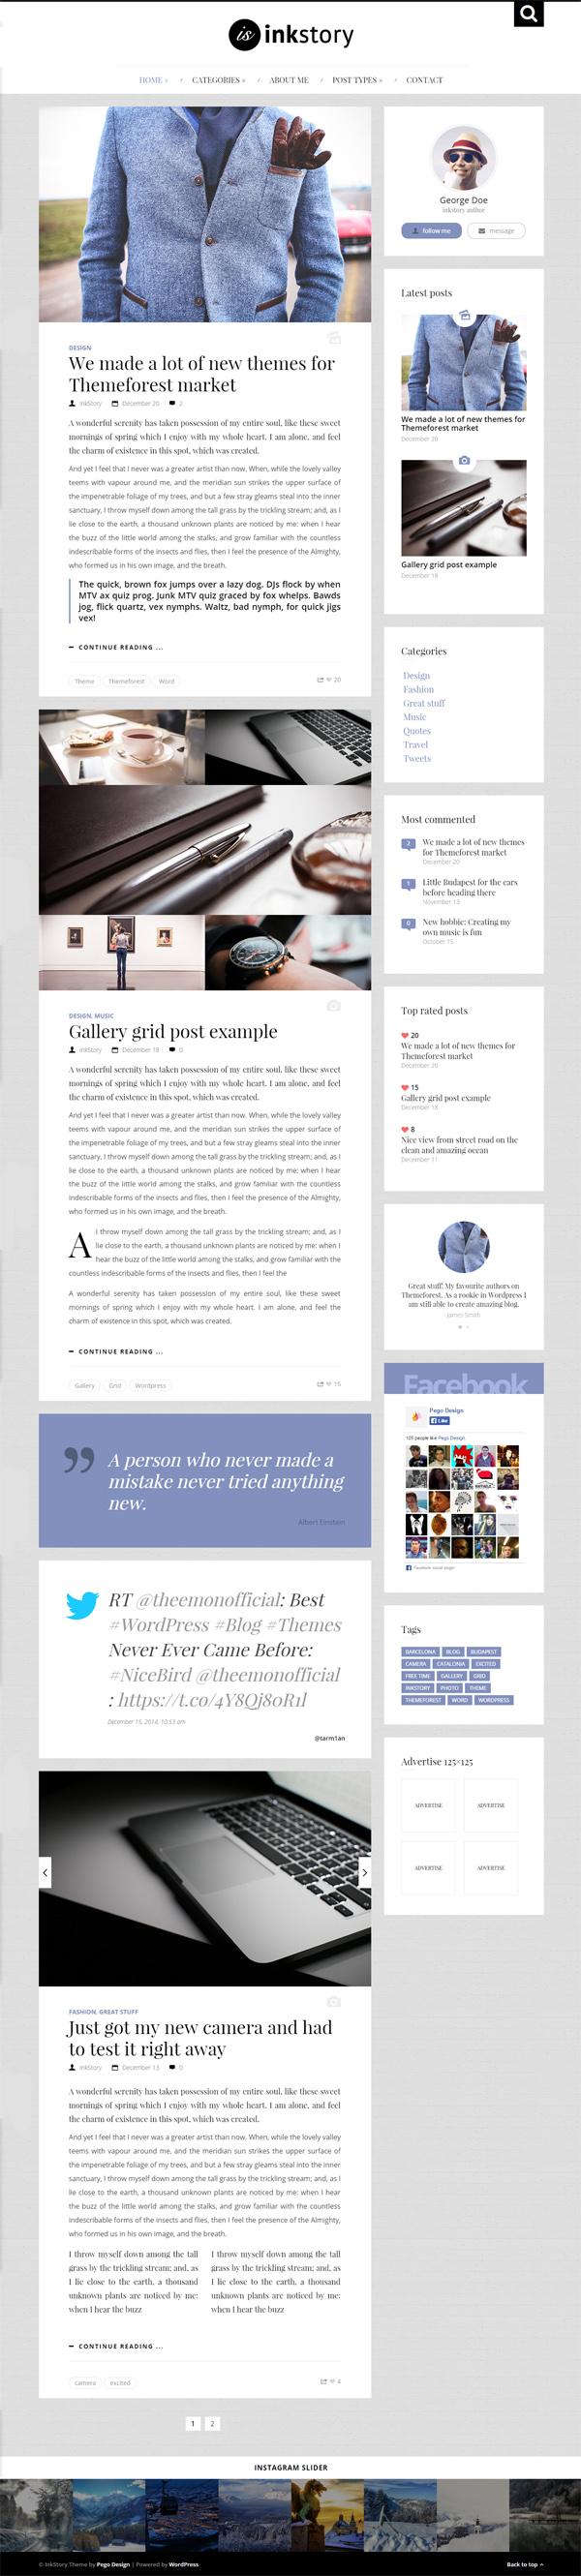 InkStory - Personal, News, Blog WordPress Theme